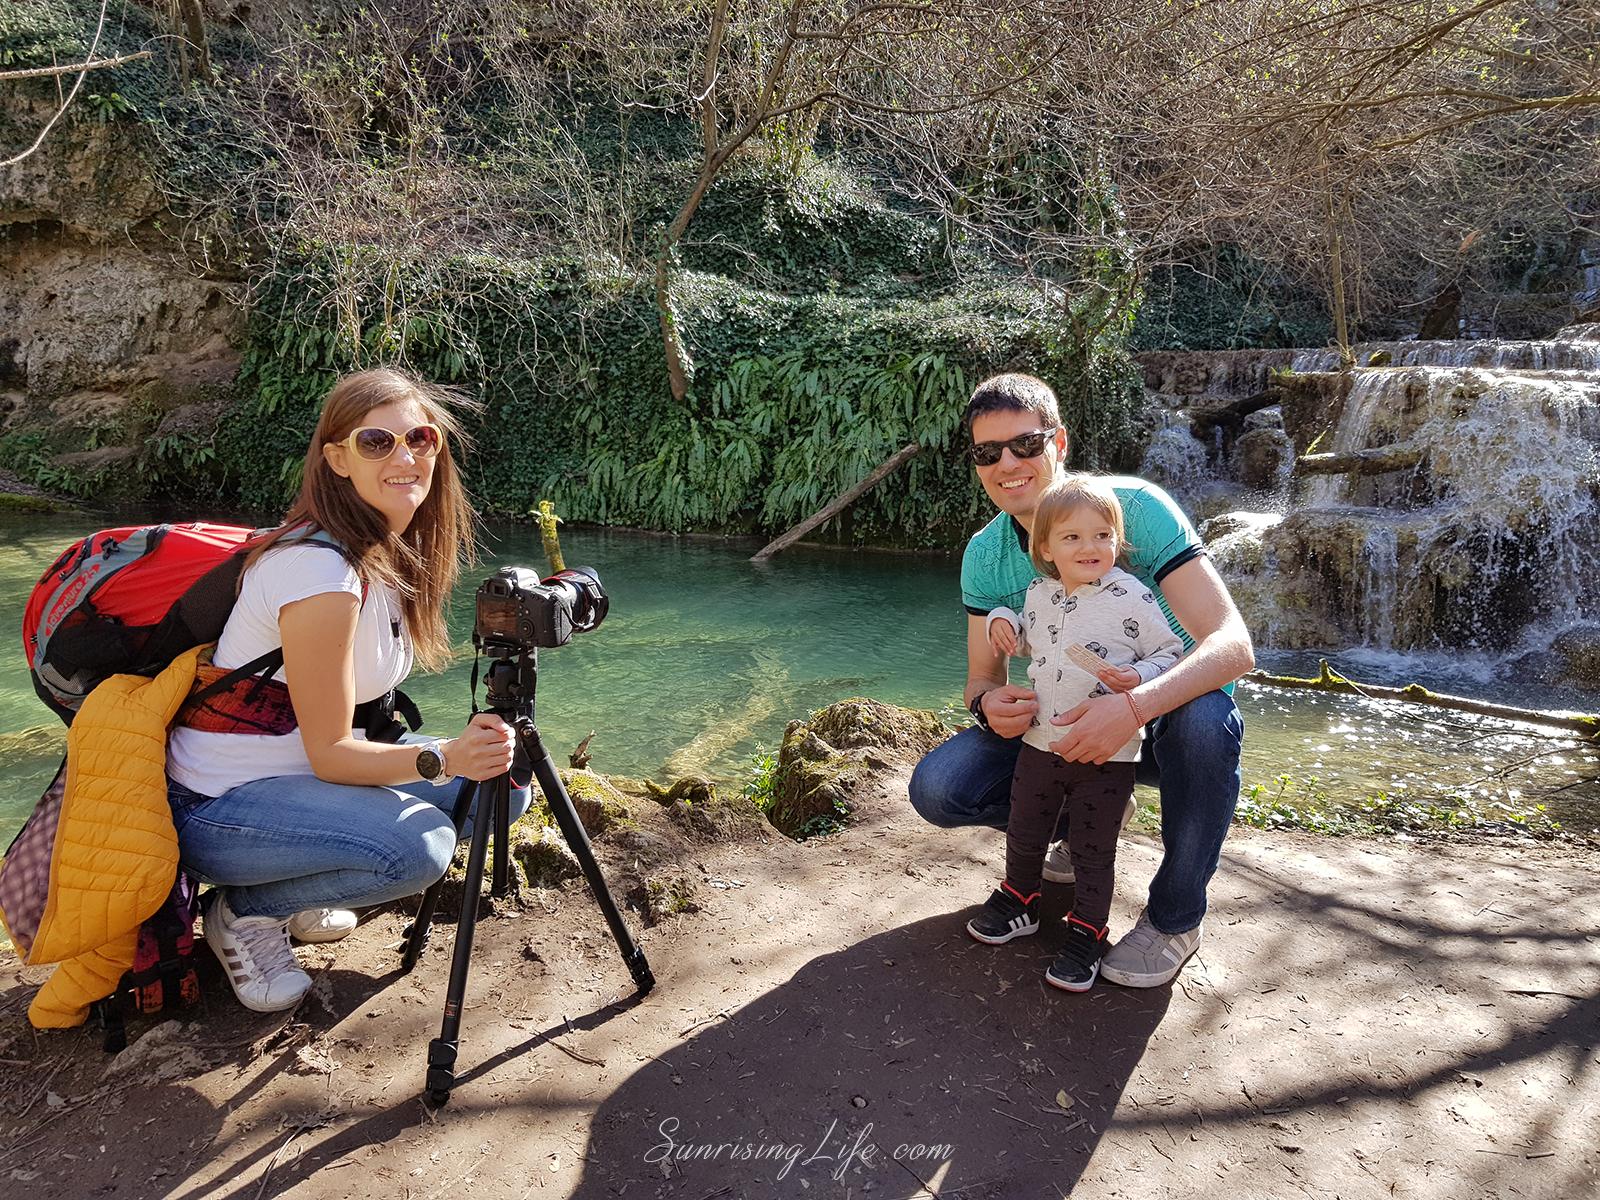 забележителности около ловеч - крушунски водопади и деветашката пещера